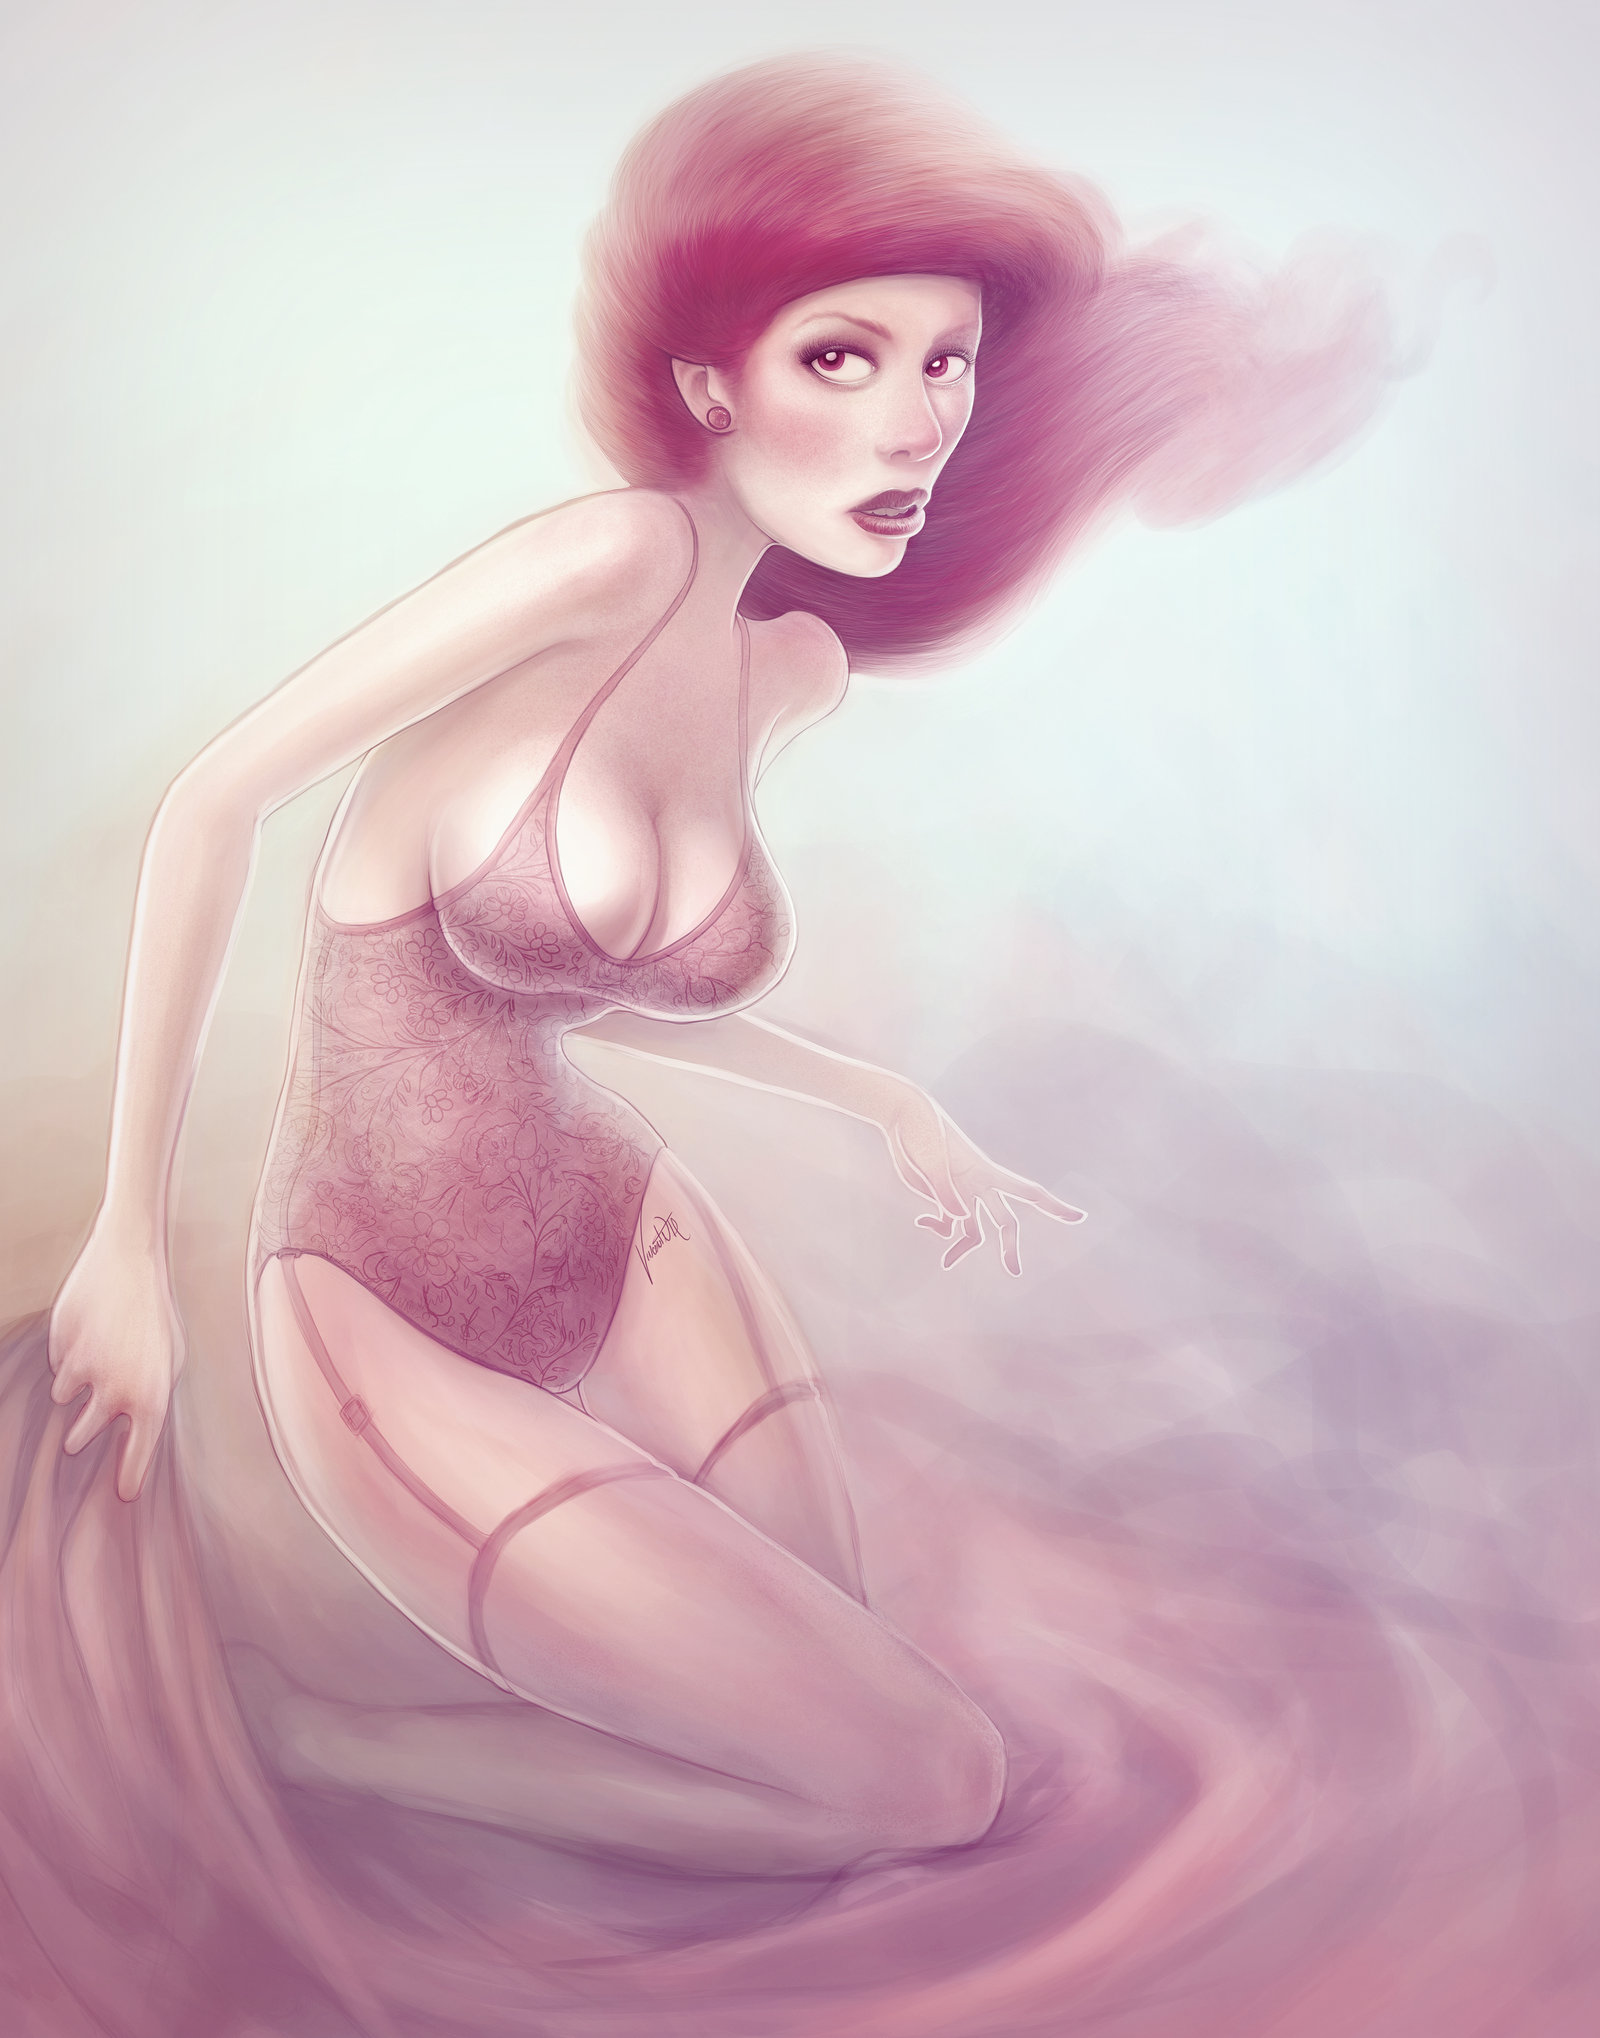 Иллюстрации-девушек-by-Vincent-Hachen